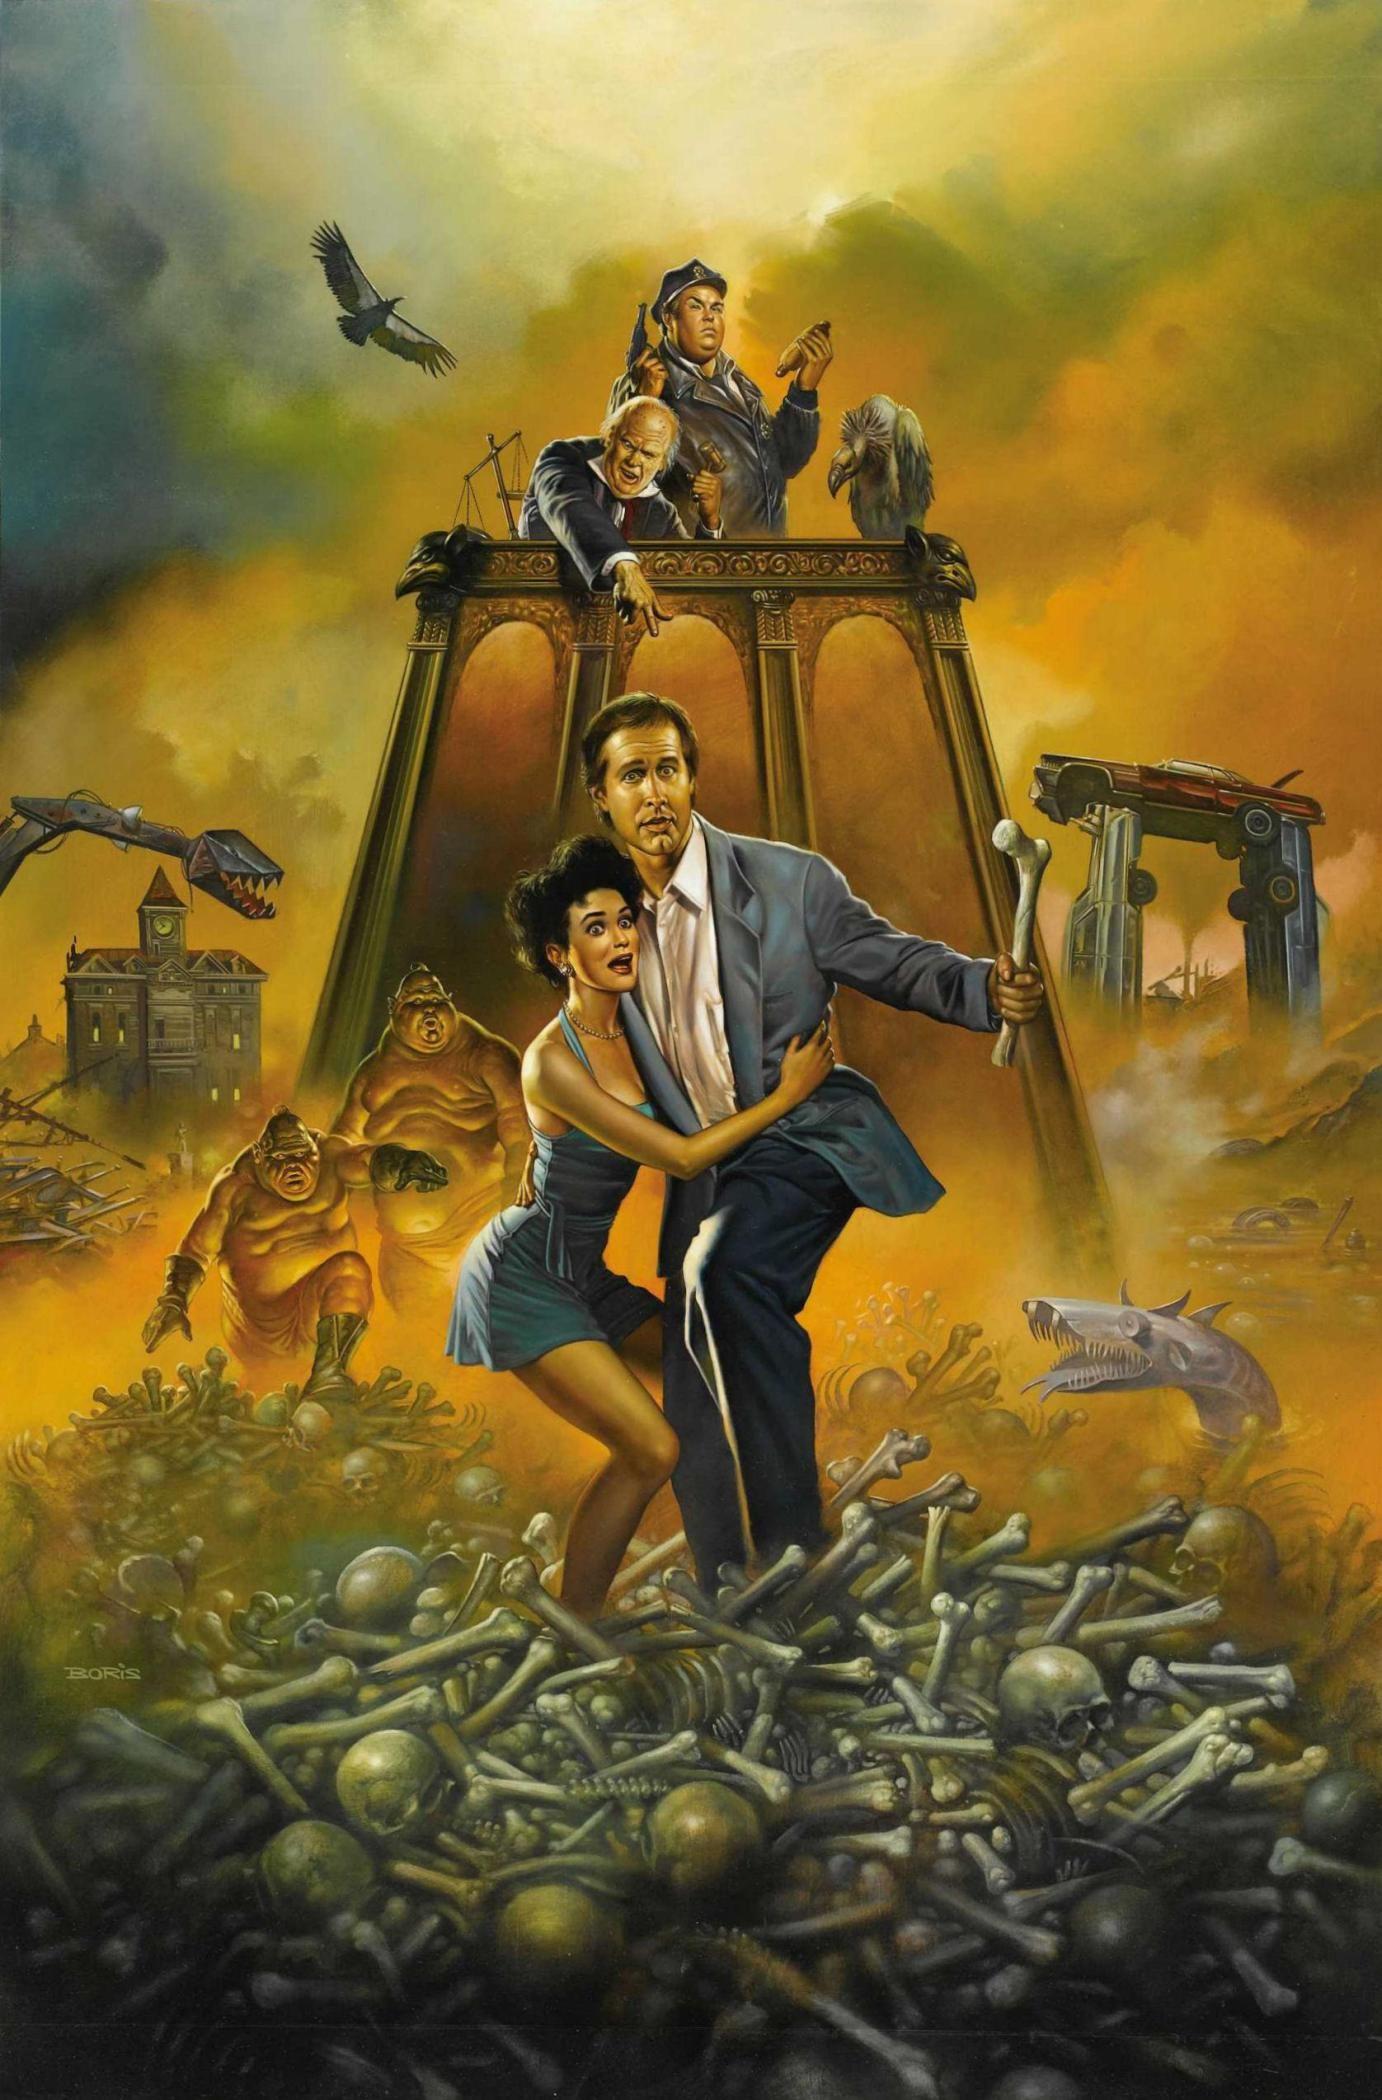 Movies thechive boris vallejo vallejo movie art